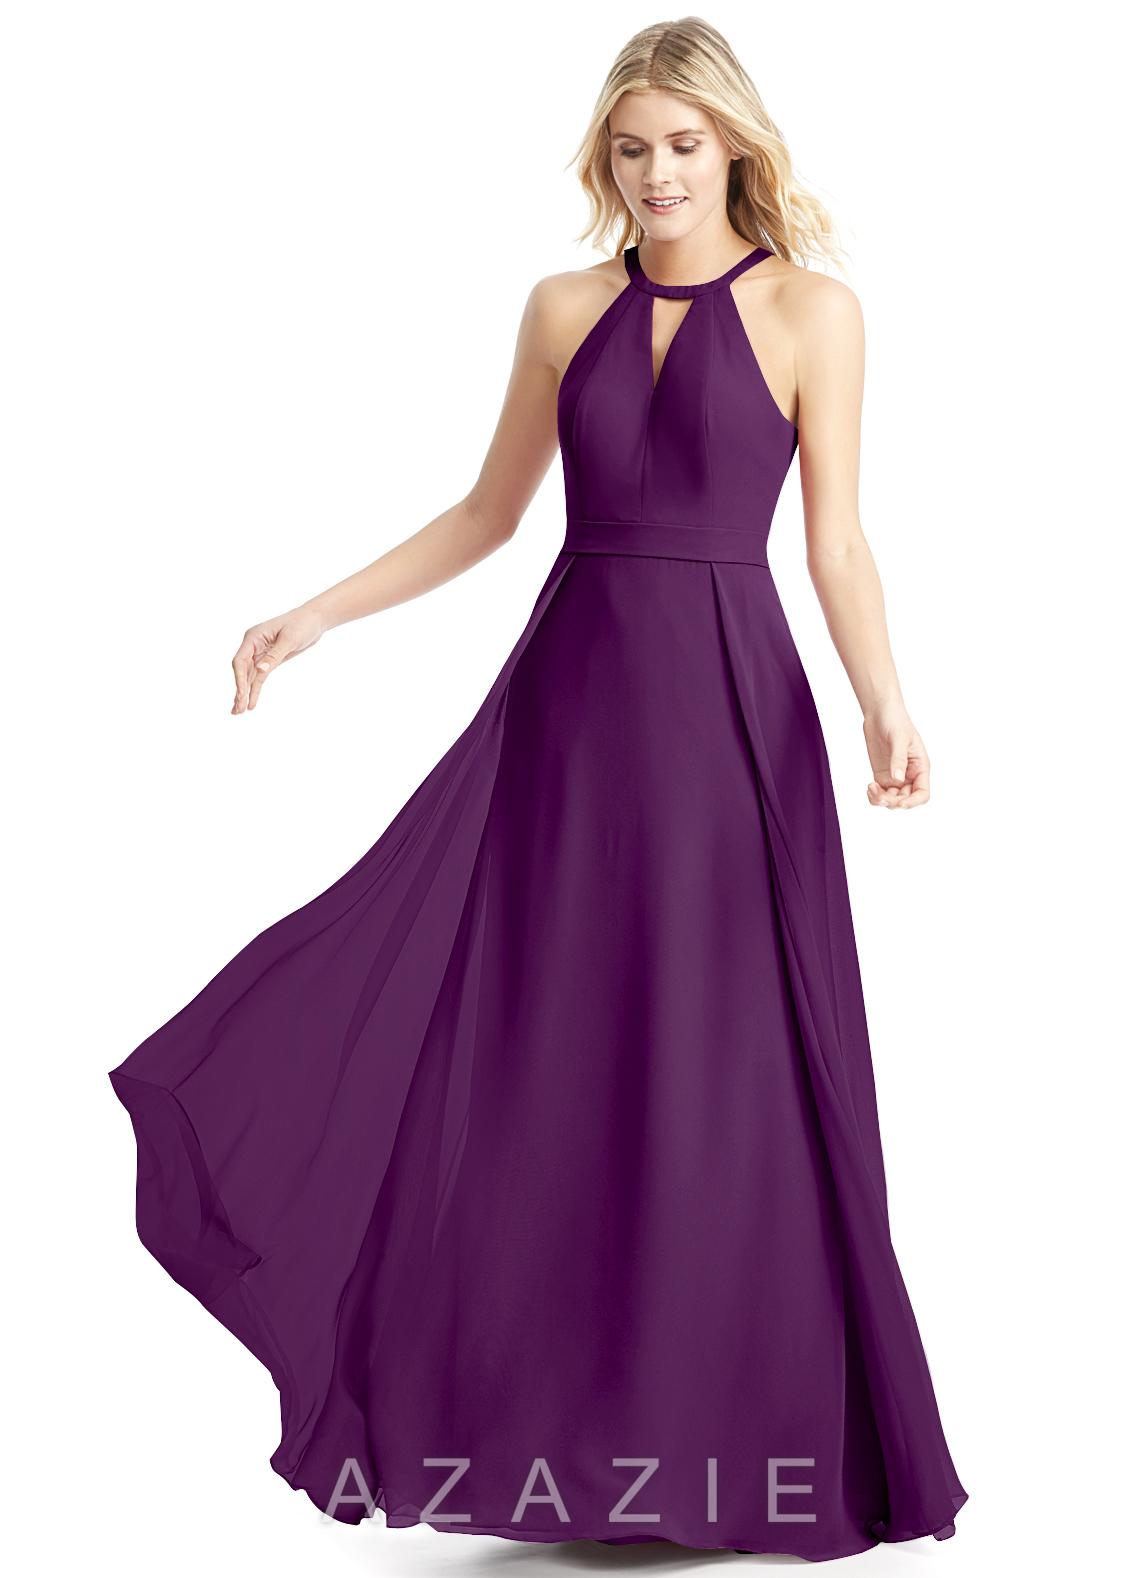 Azazie melody bridesmaid dress azazie color grape ombrellifo Choice Image